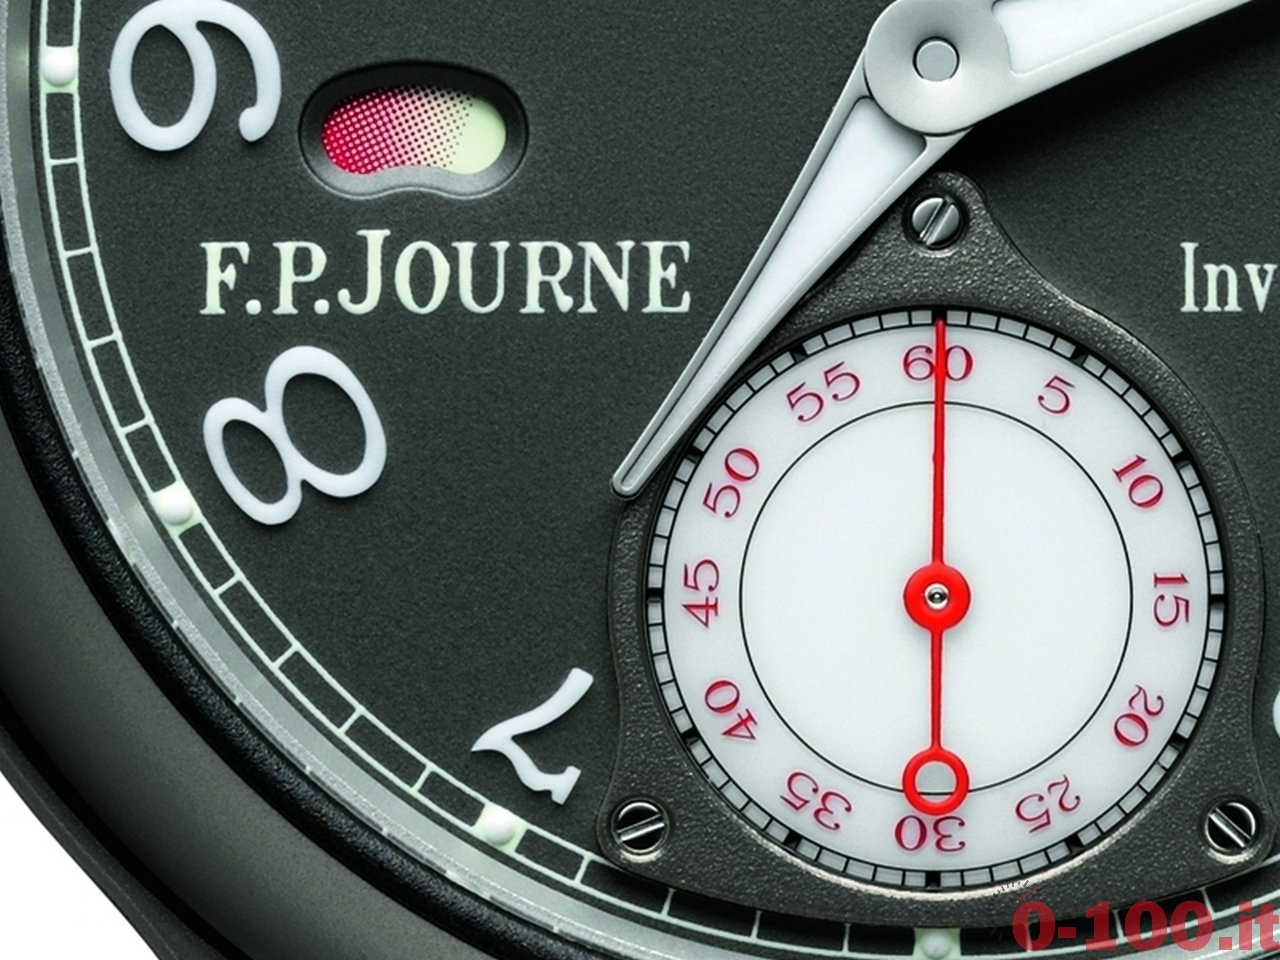 f-p-journe-octa-sport-titanium-prezzo-price-0-100_3